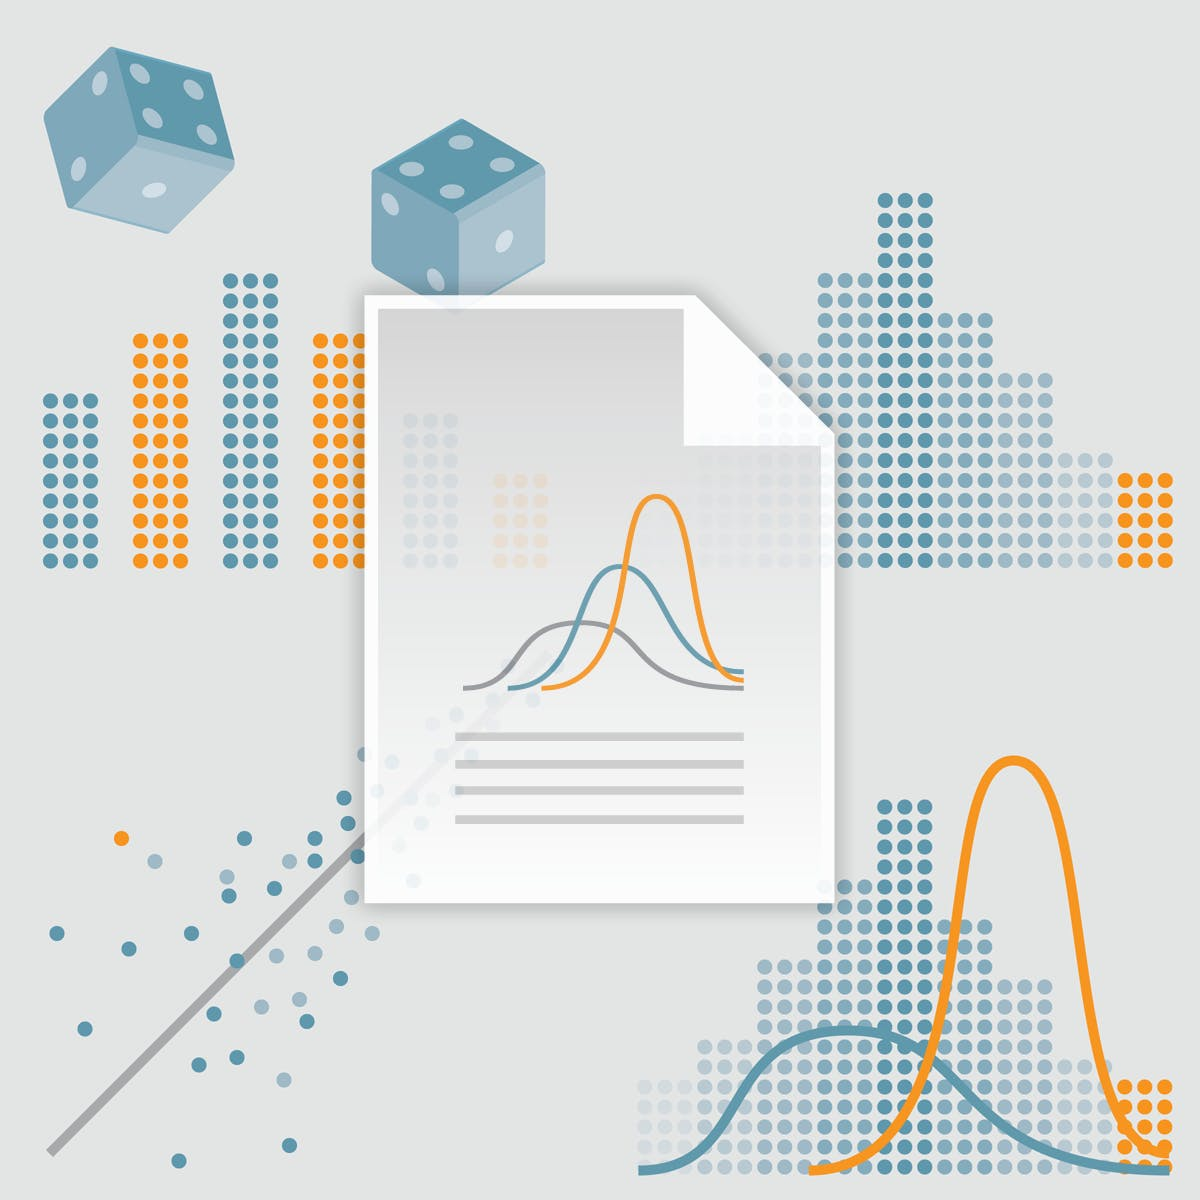 Statistics with R Capstone